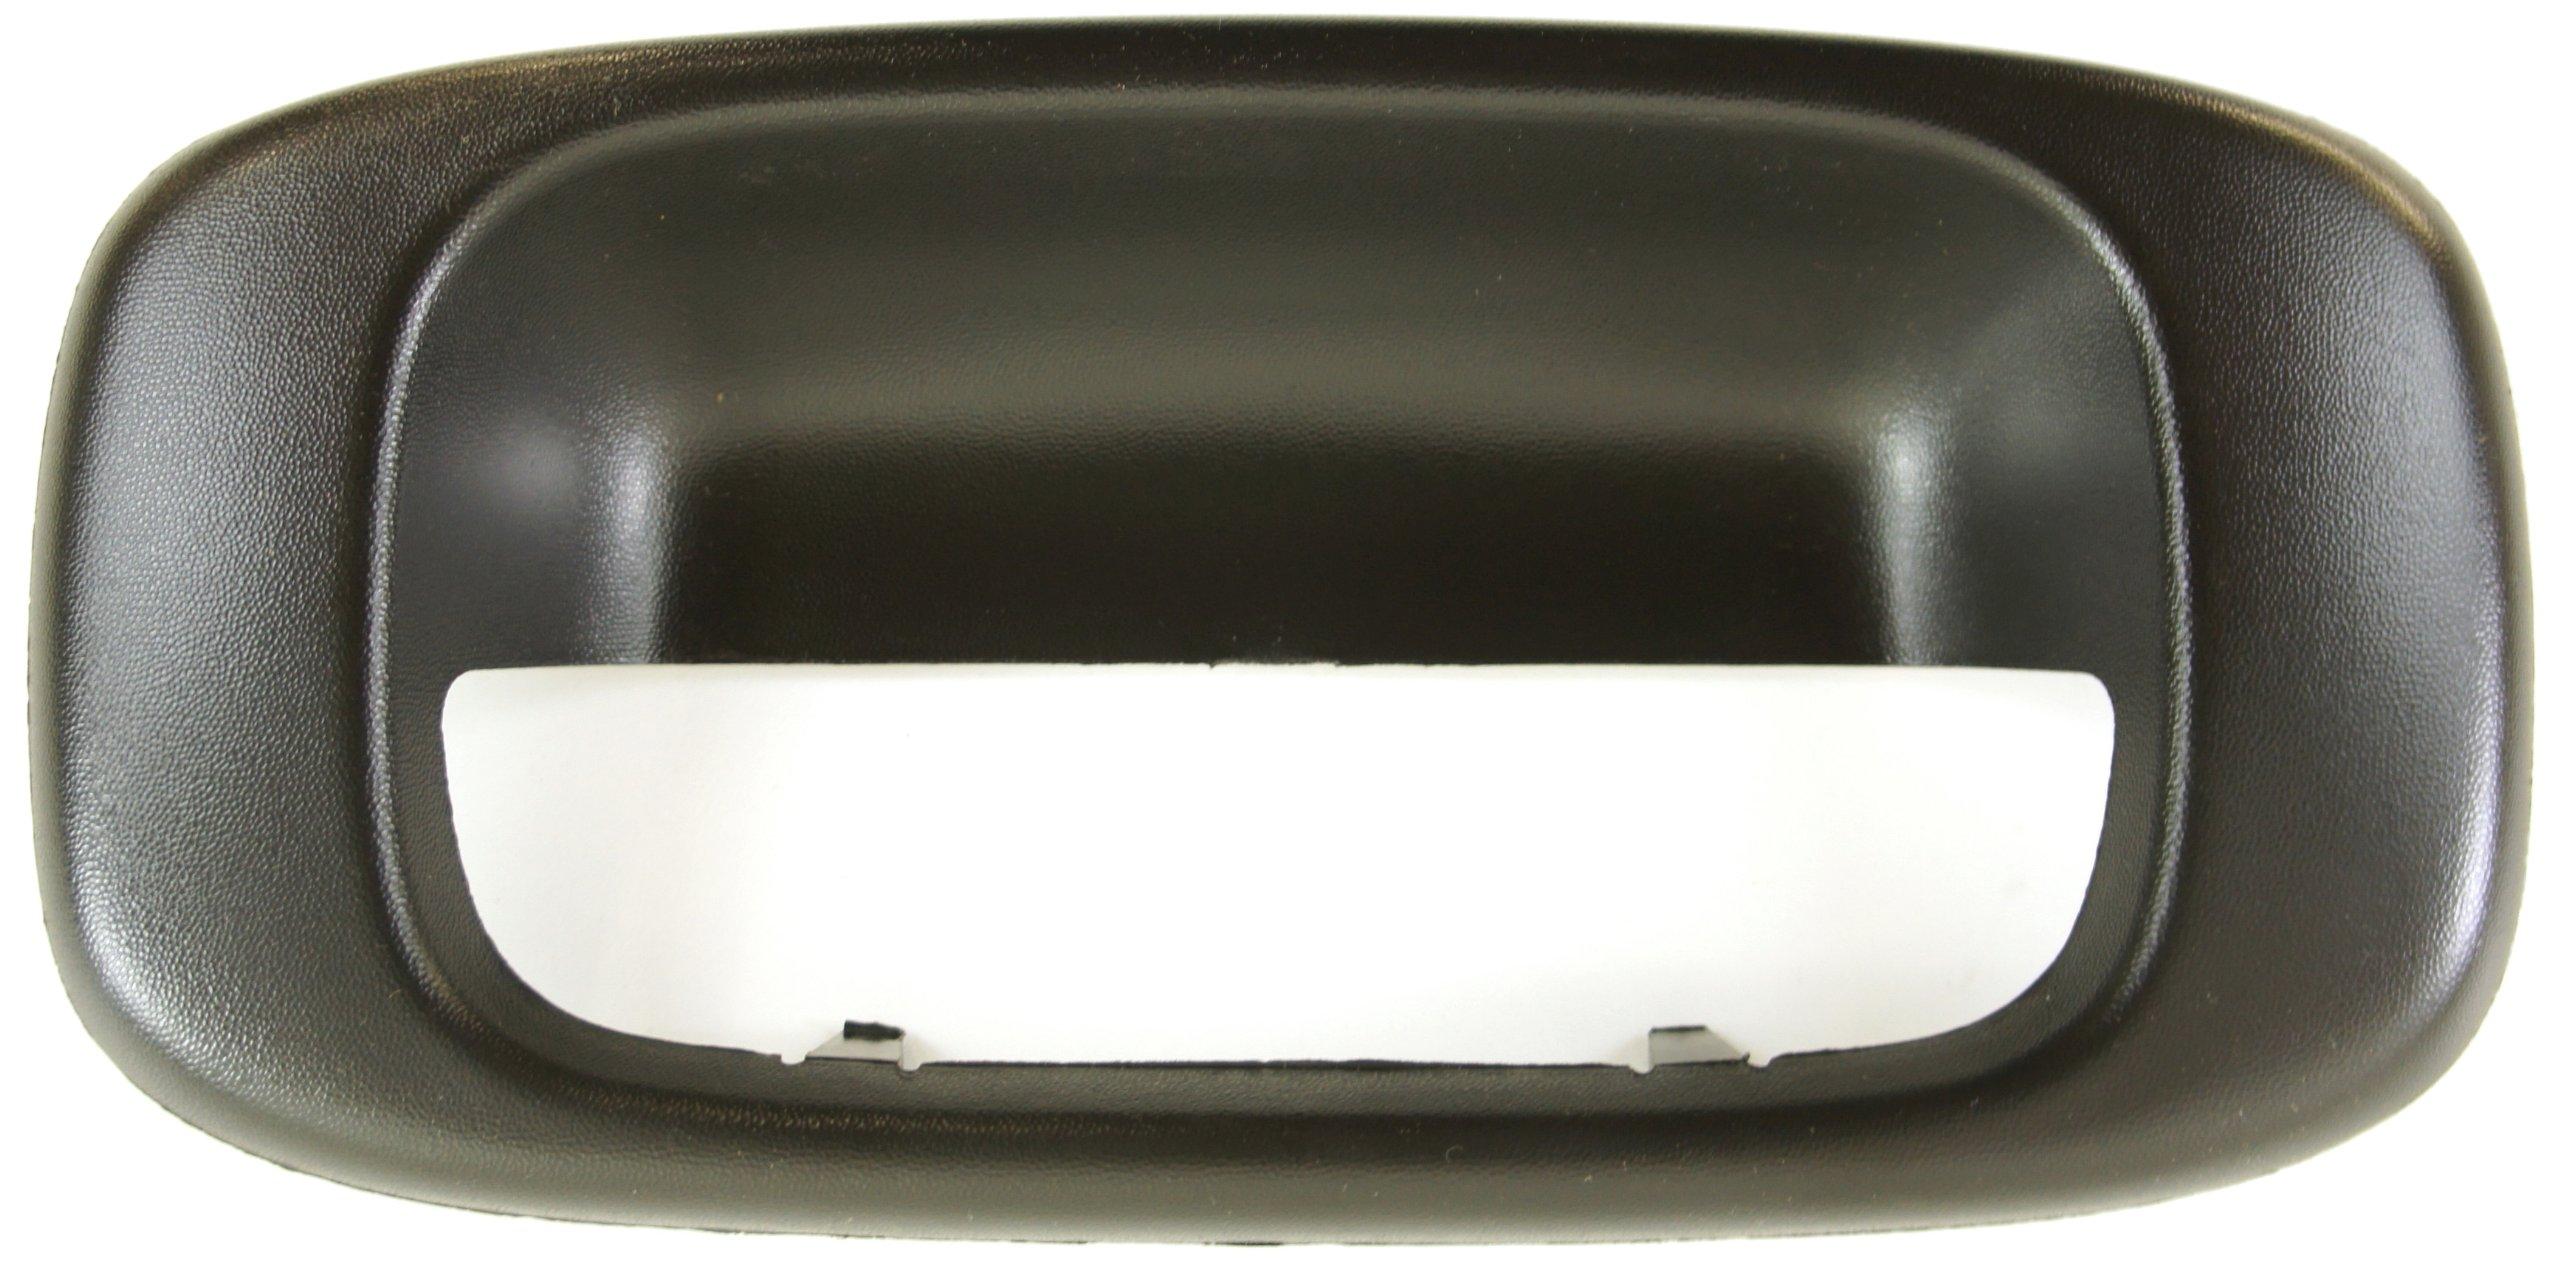 Genuine GM Parts 15228539 Rear Gate Handle Bezel